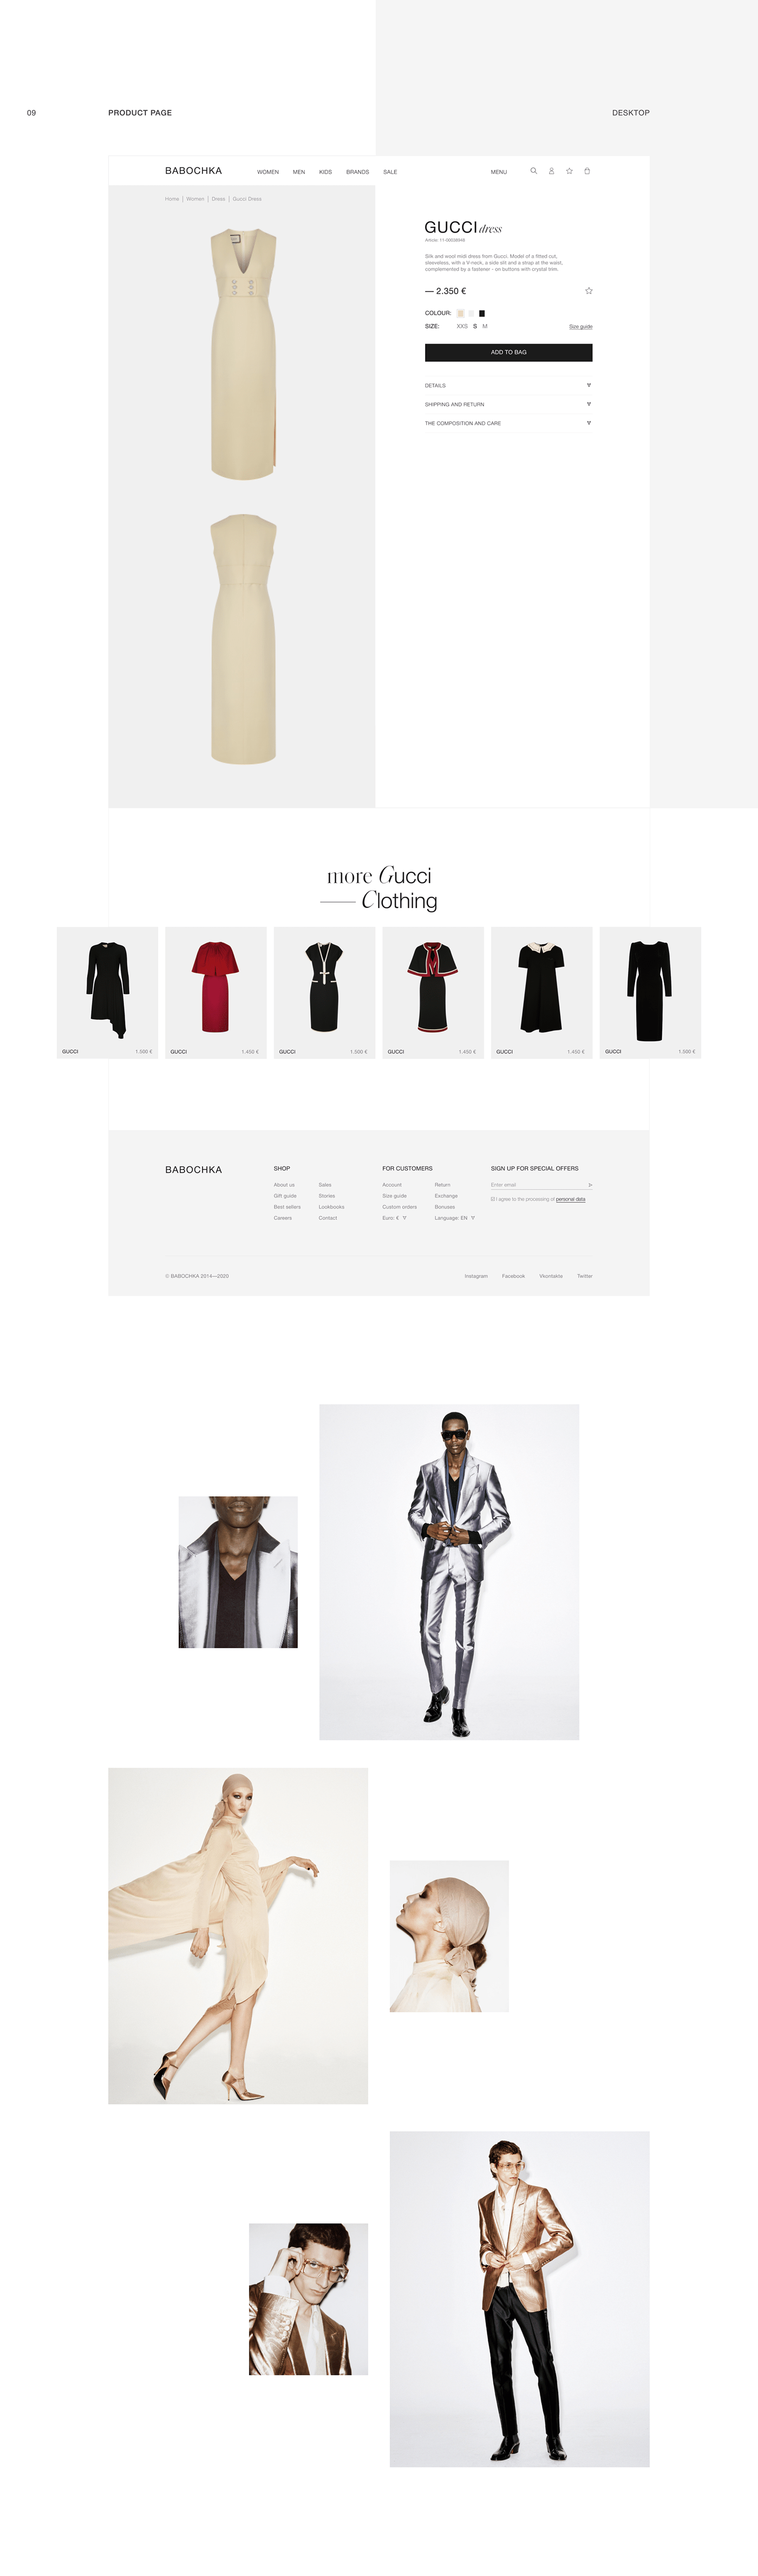 Product page og the progect